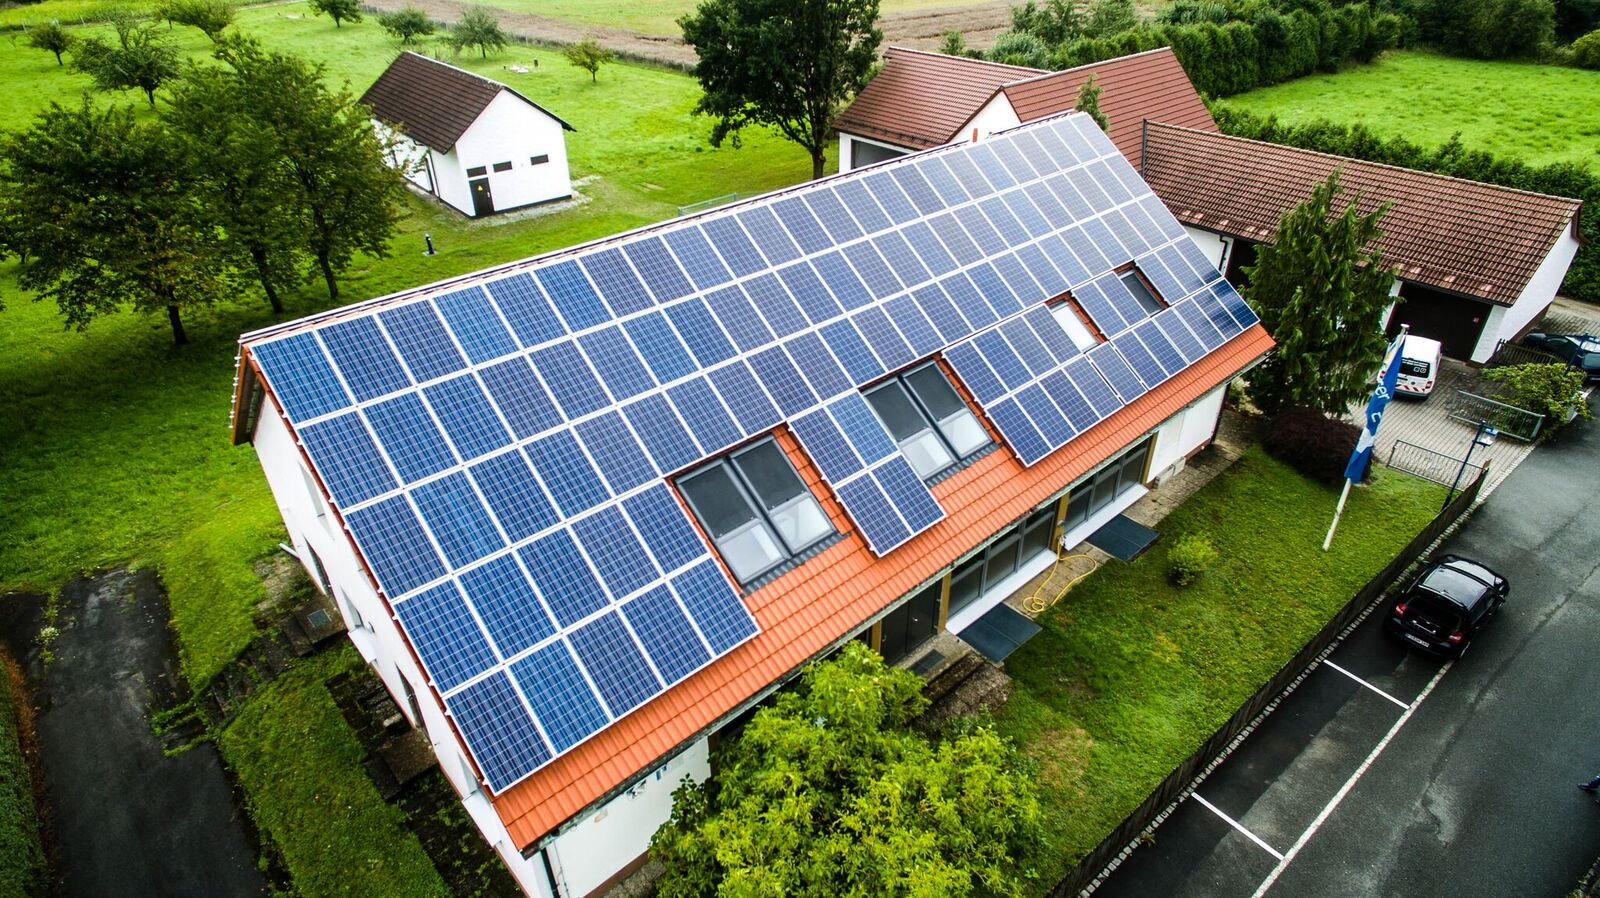 photovoltaik solar speicher solaranlagen photovoltaik. Black Bedroom Furniture Sets. Home Design Ideas